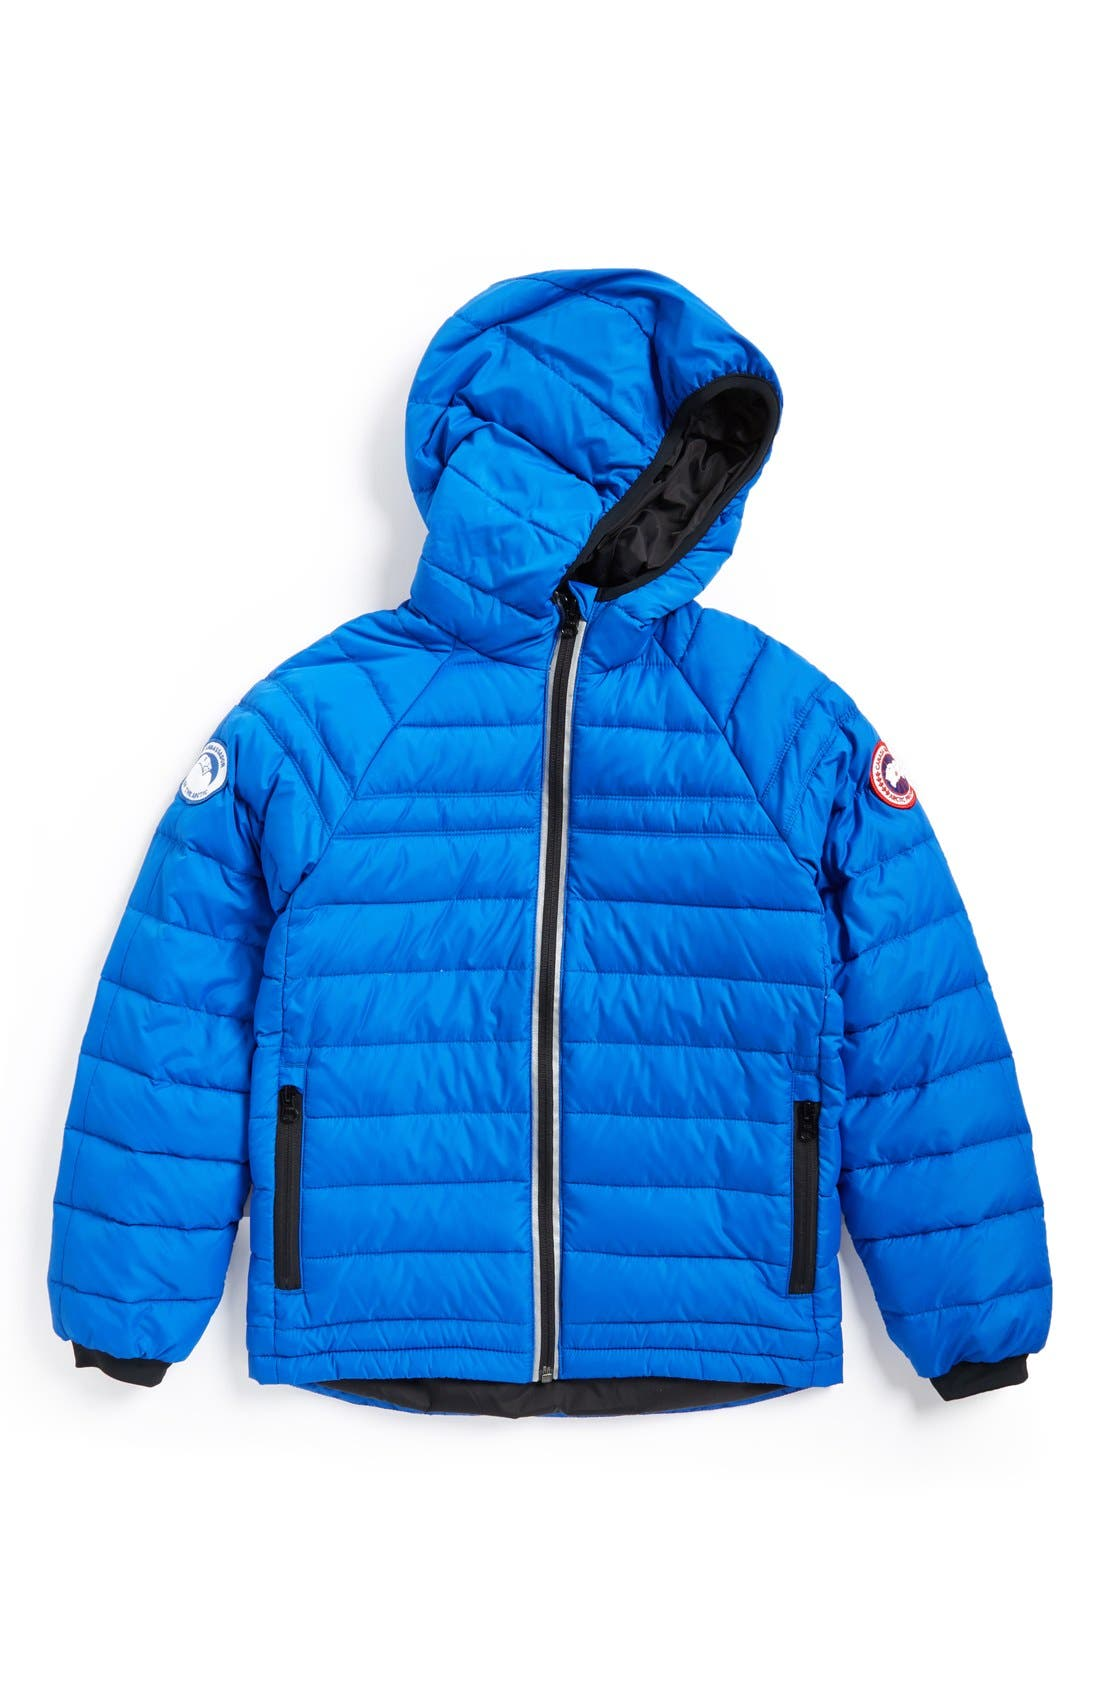 Main Image - Canada Goose Sherwood Hooded Packable Jacket (Big Kid)